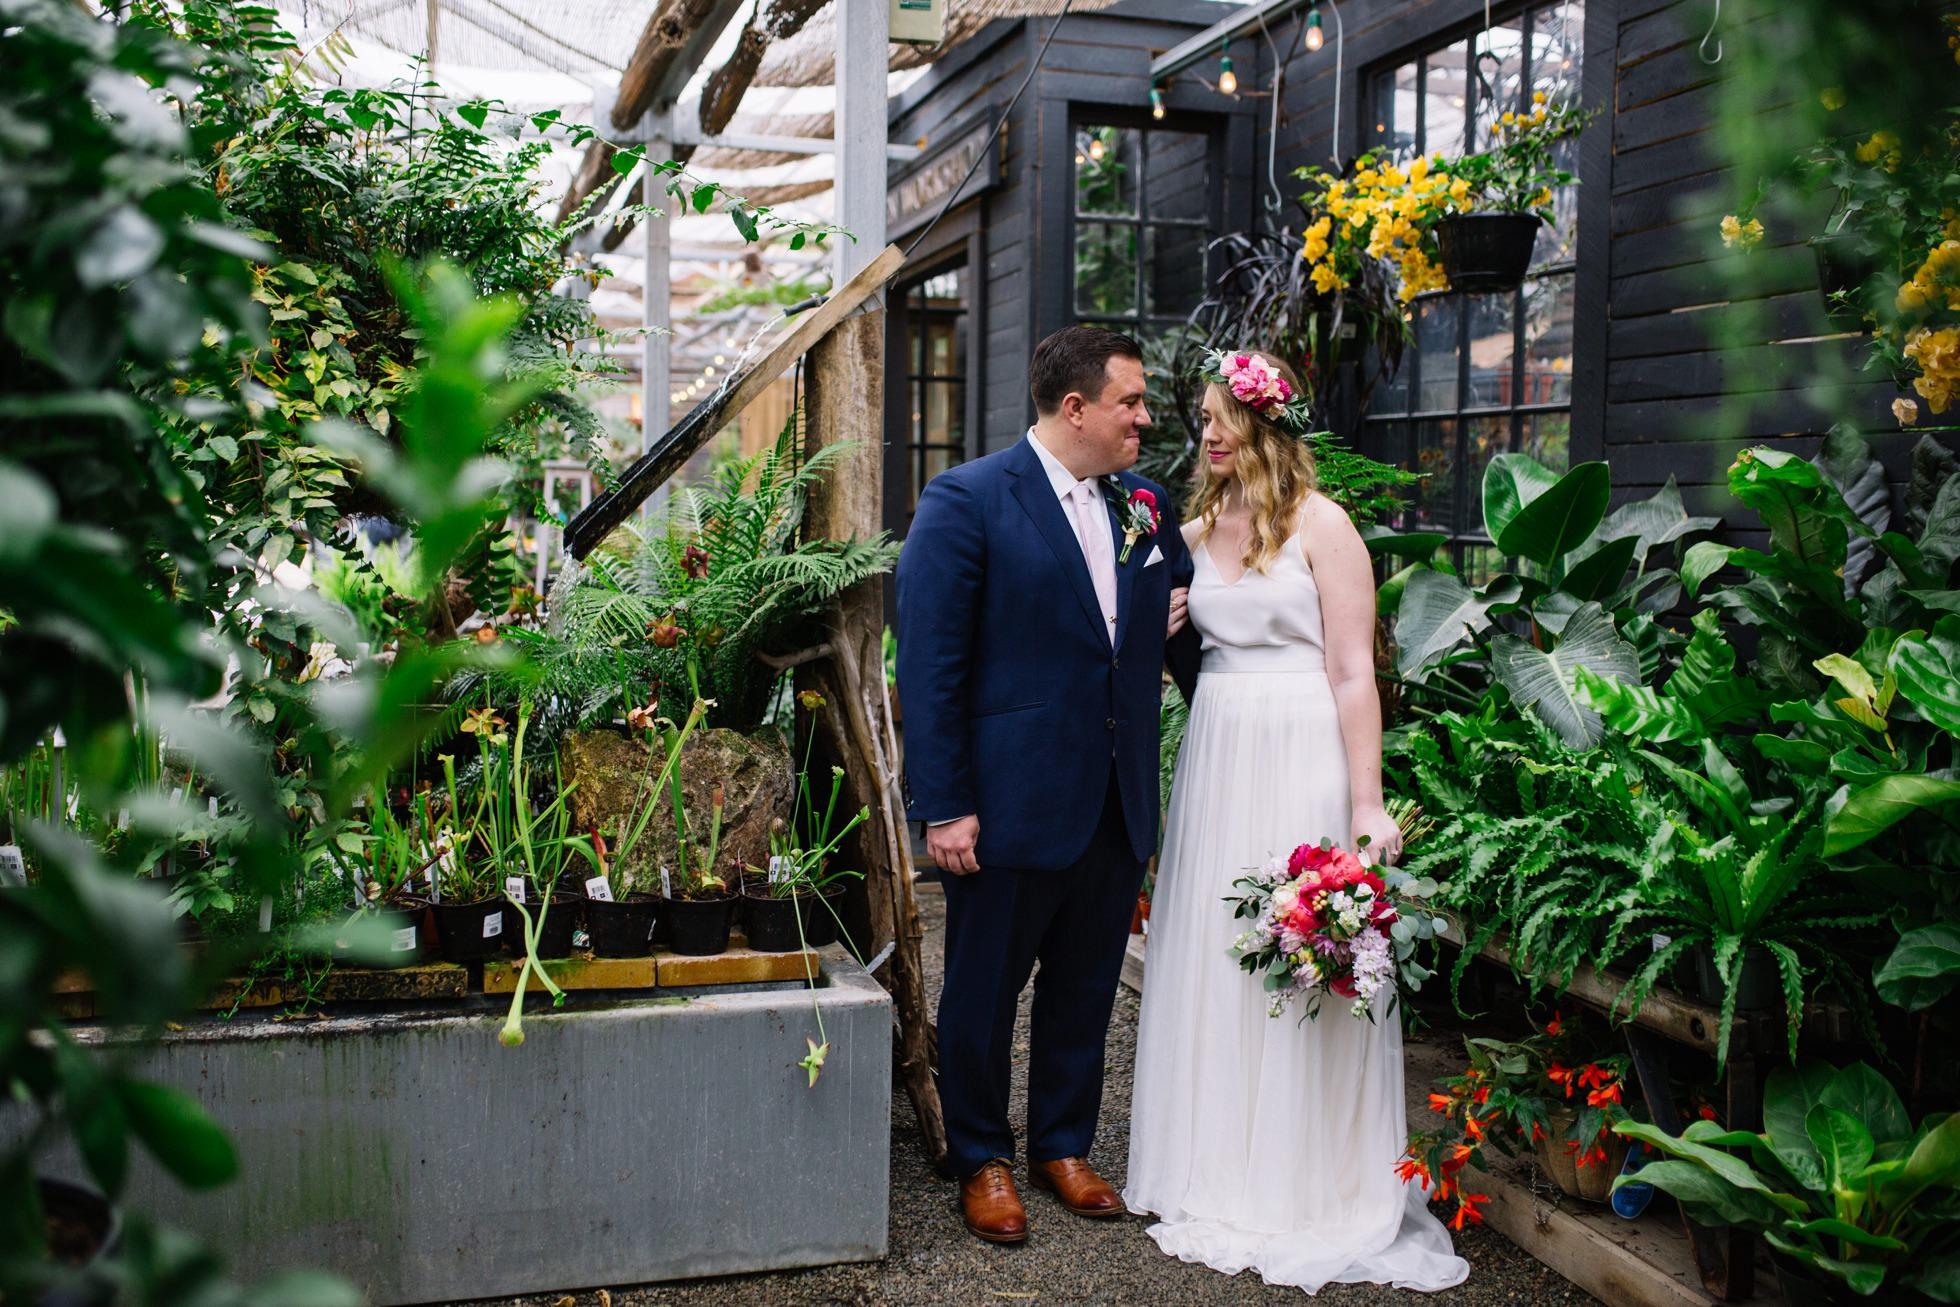 Best Unique PA NY NJ Wedding Venues - Terrain Anthropologie Garden